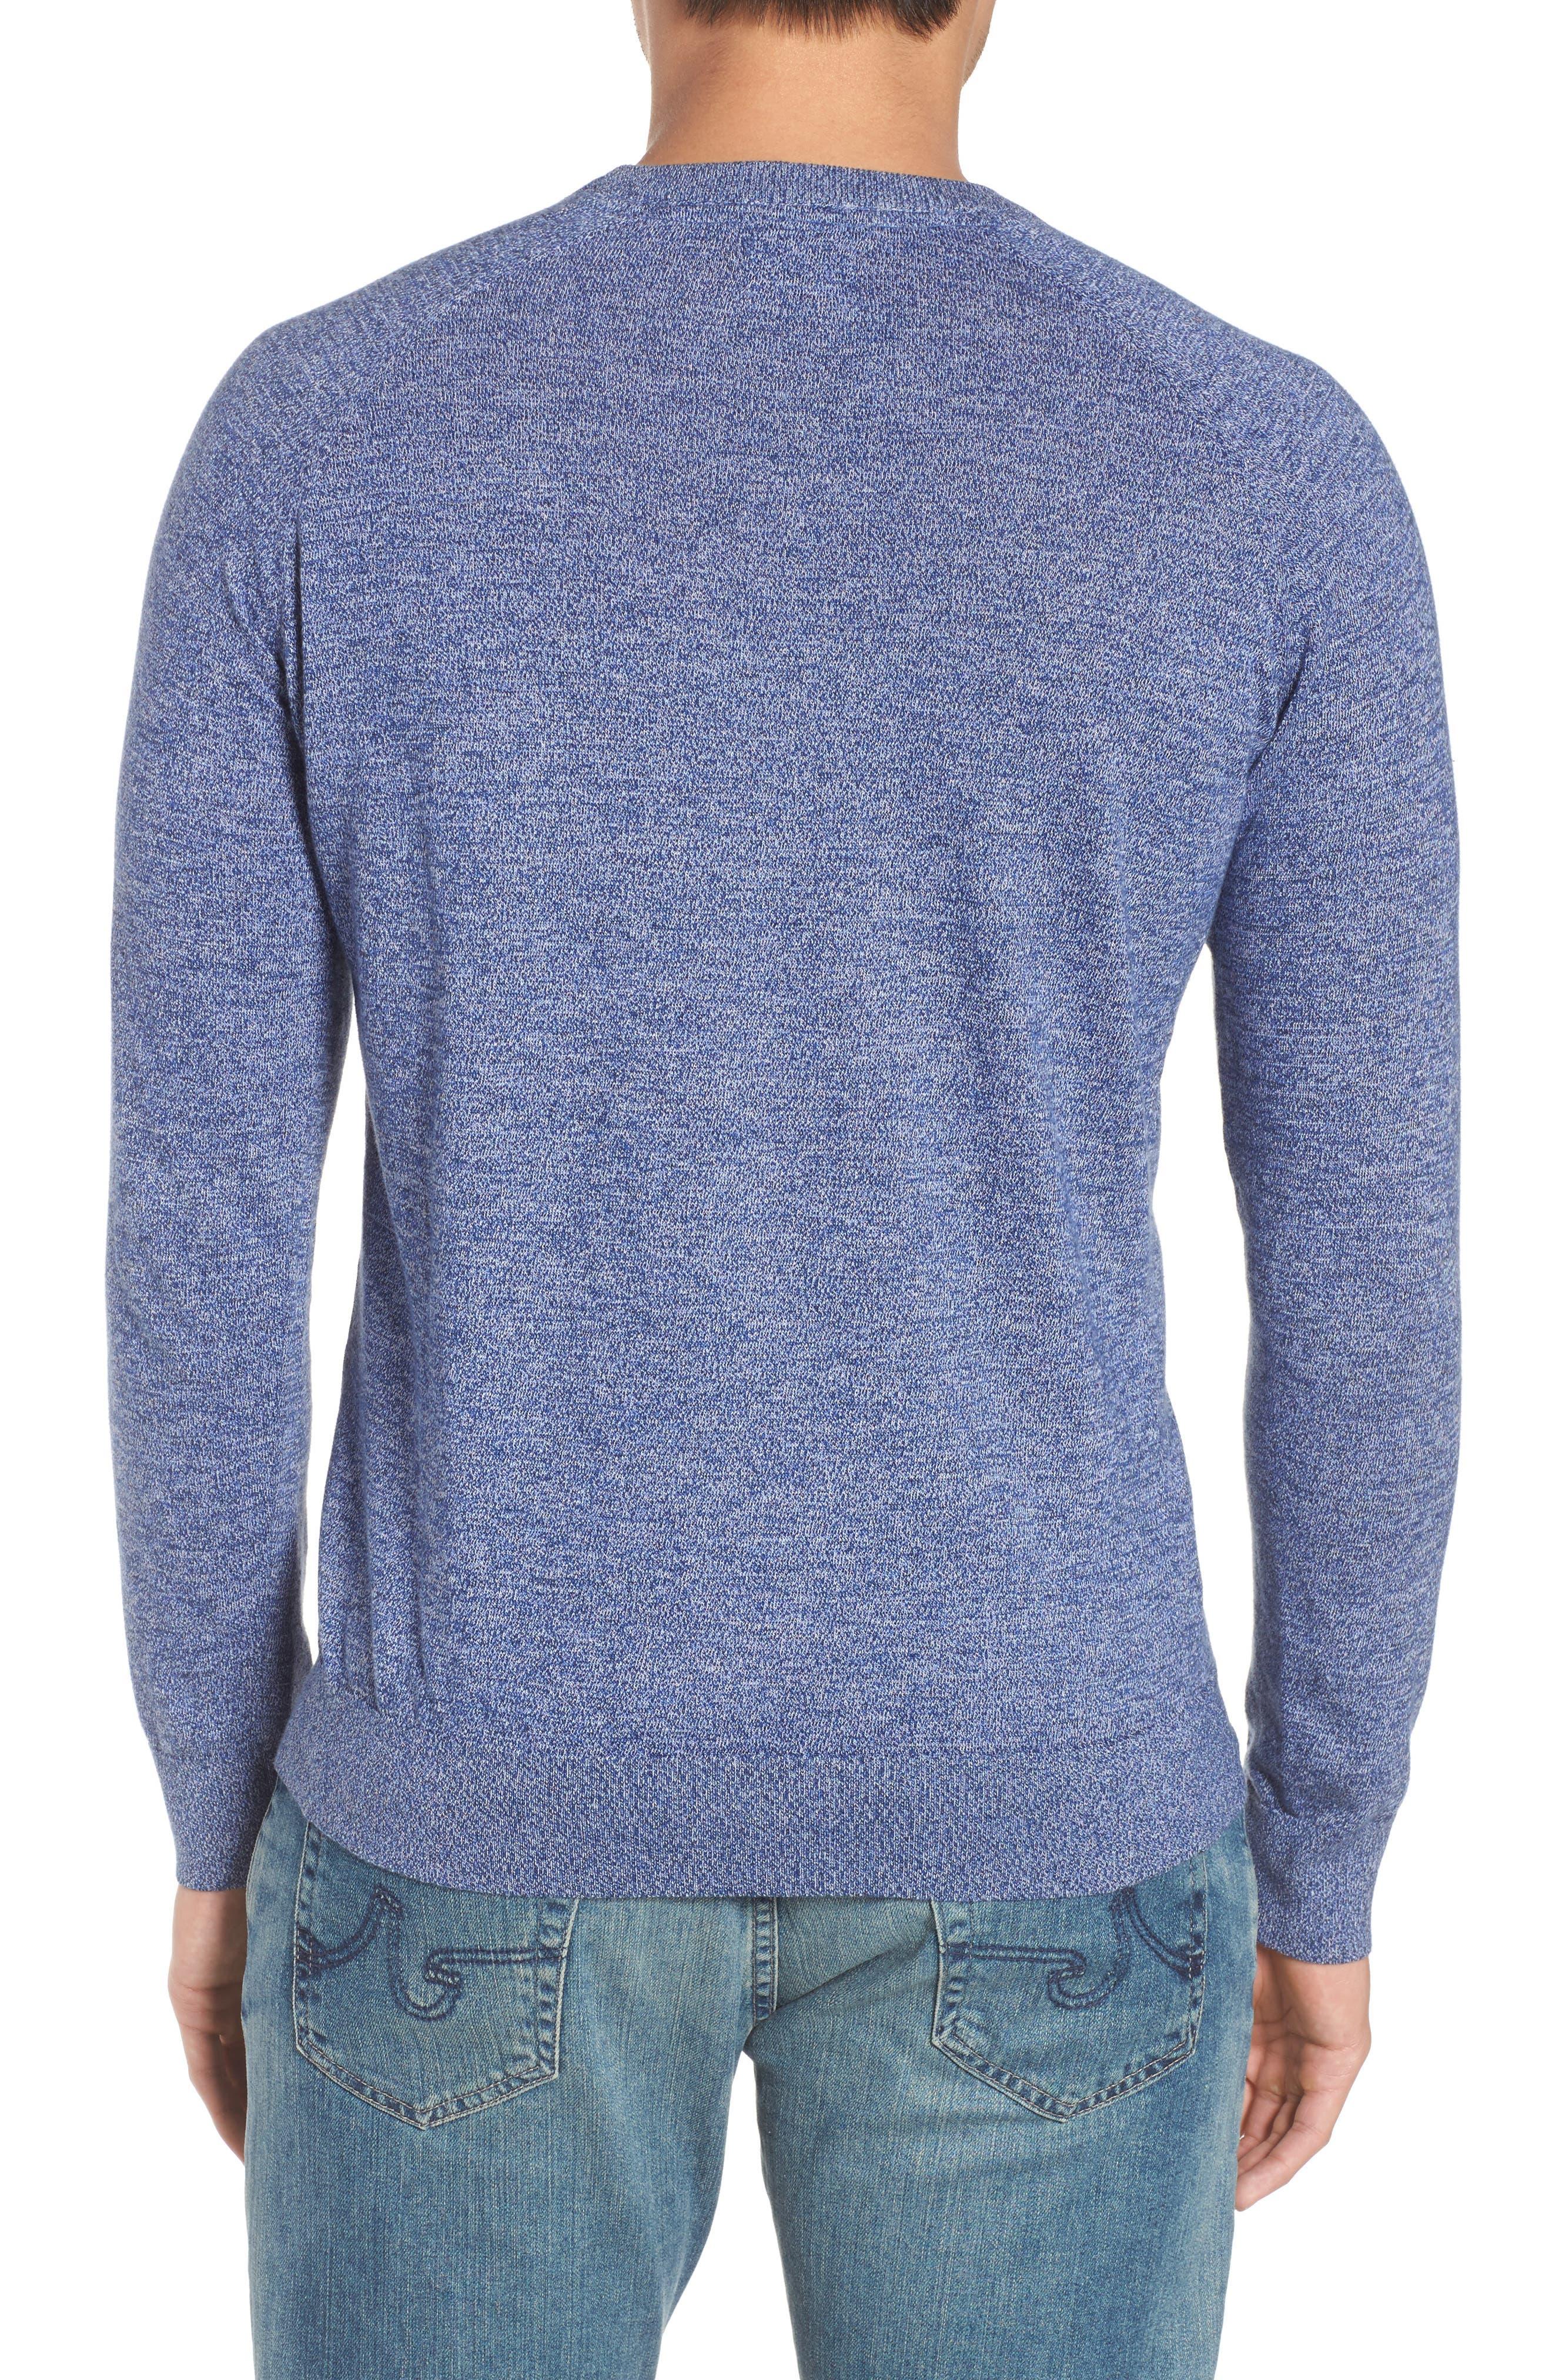 Space Dye Crewneck Shirt,                             Alternate thumbnail 2, color,                             450